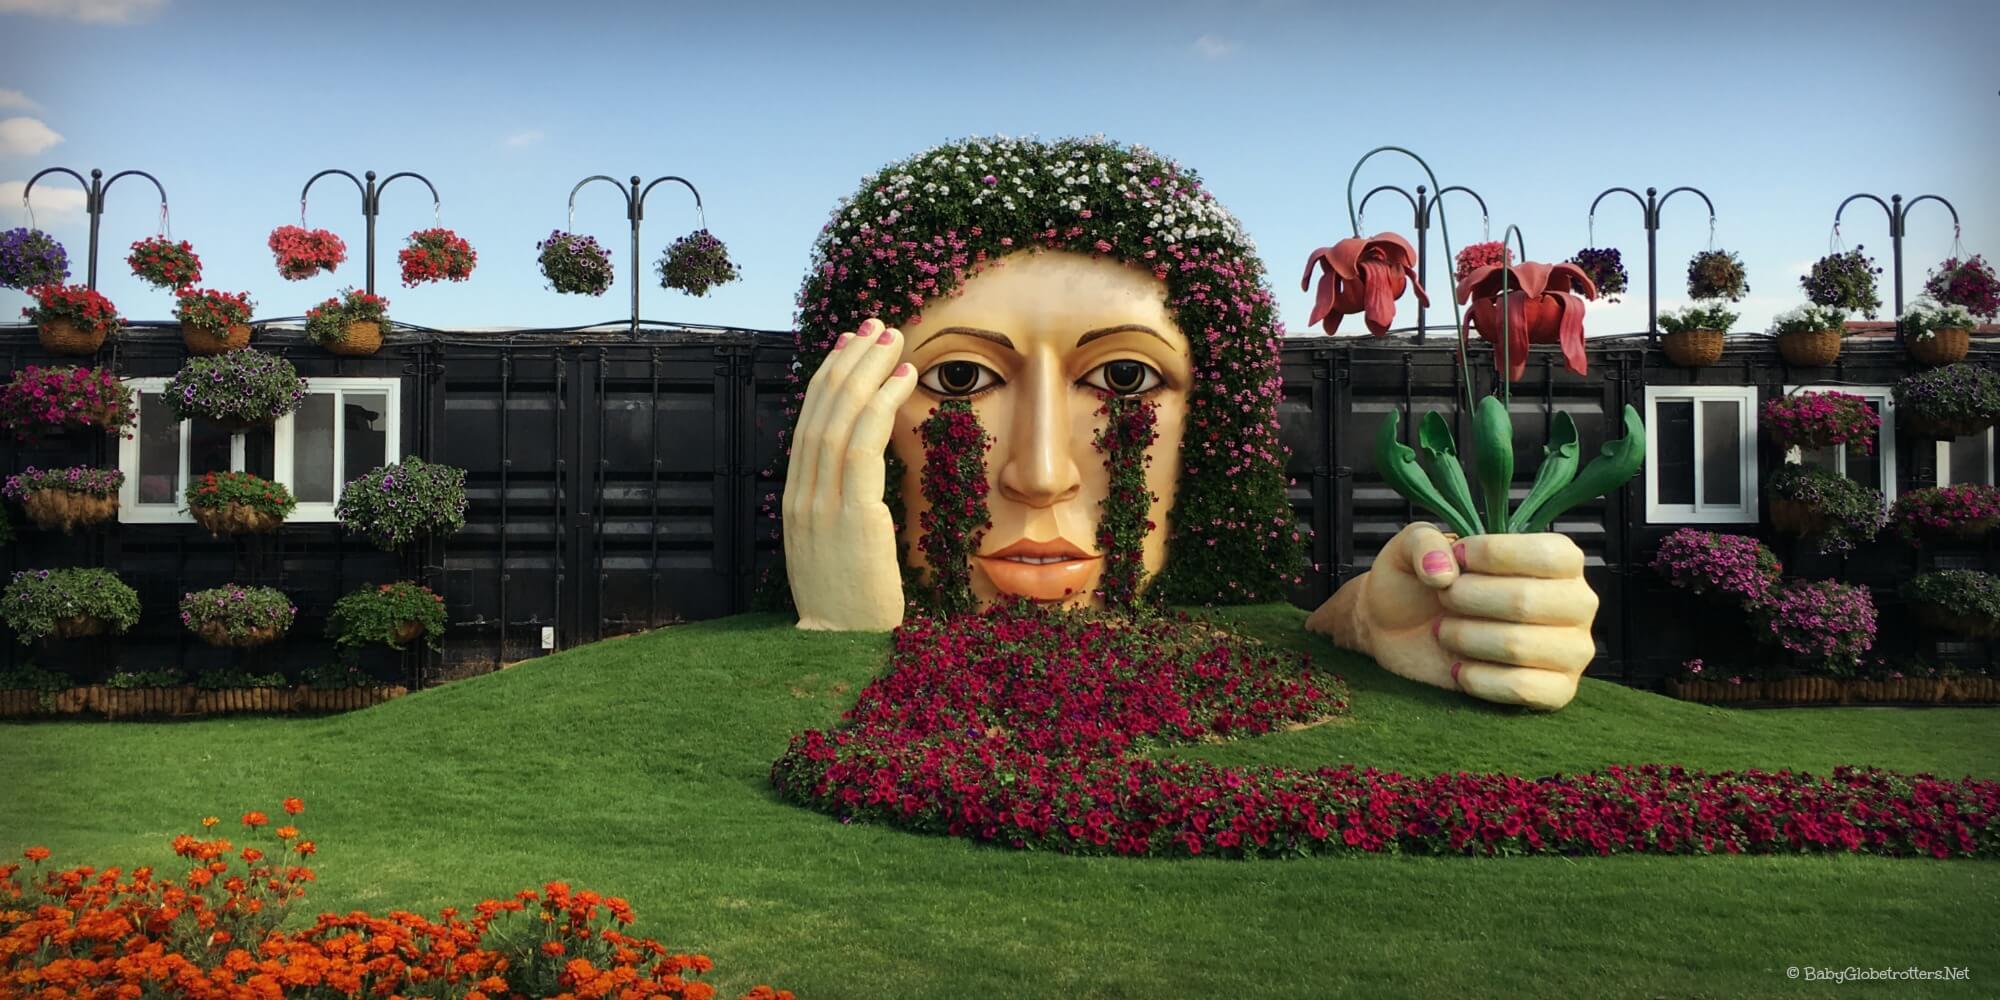 net dubai miracle garden discover the uae ourglobetrottersnet - Miracle Garden Dubai